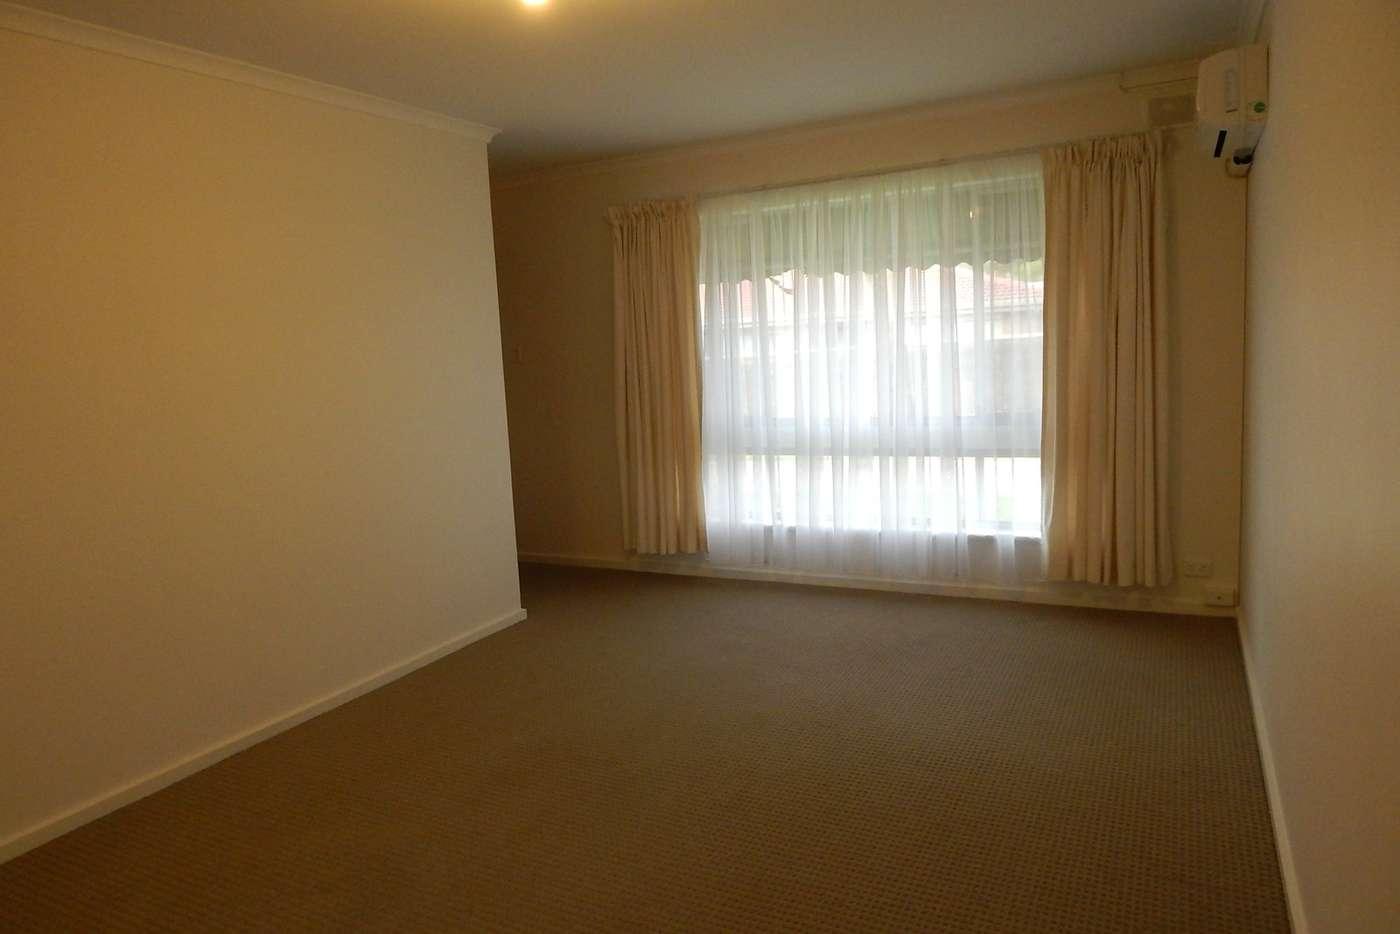 Sixth view of Homely unit listing, 3/610 Magill Road, Magill SA 5072